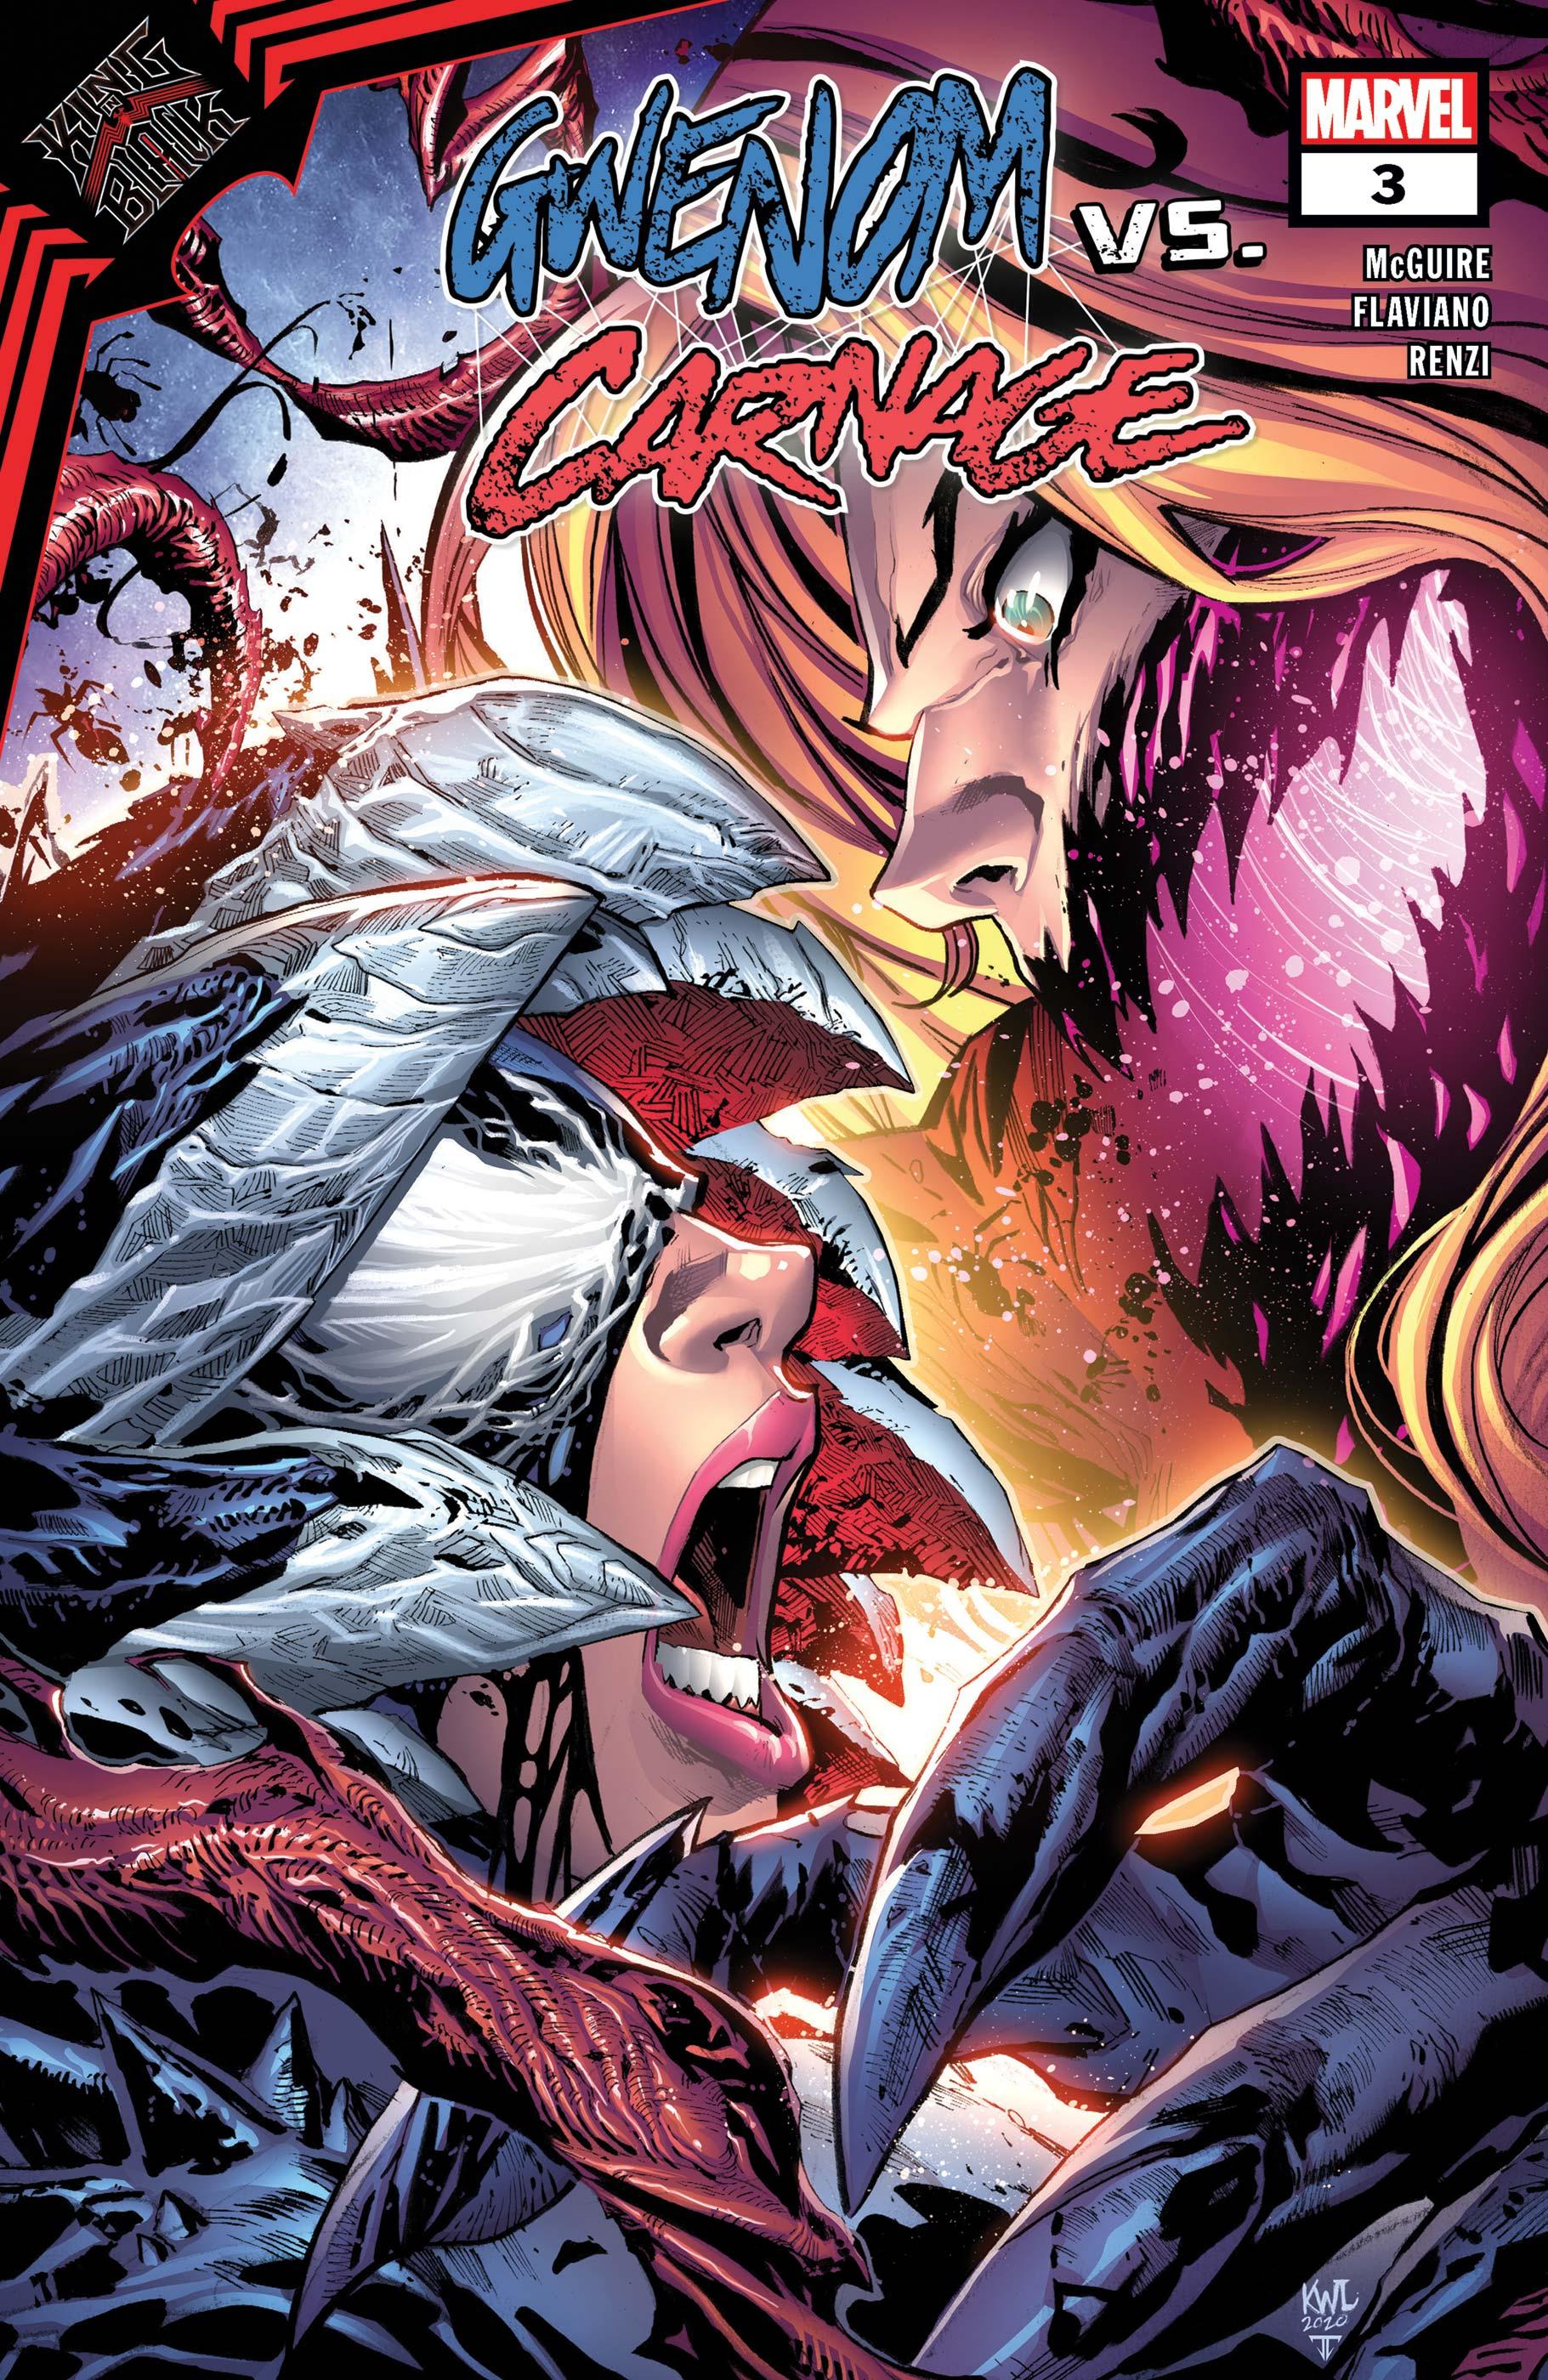 King in Black: Gwenom Vs. Carnage (2021) #3